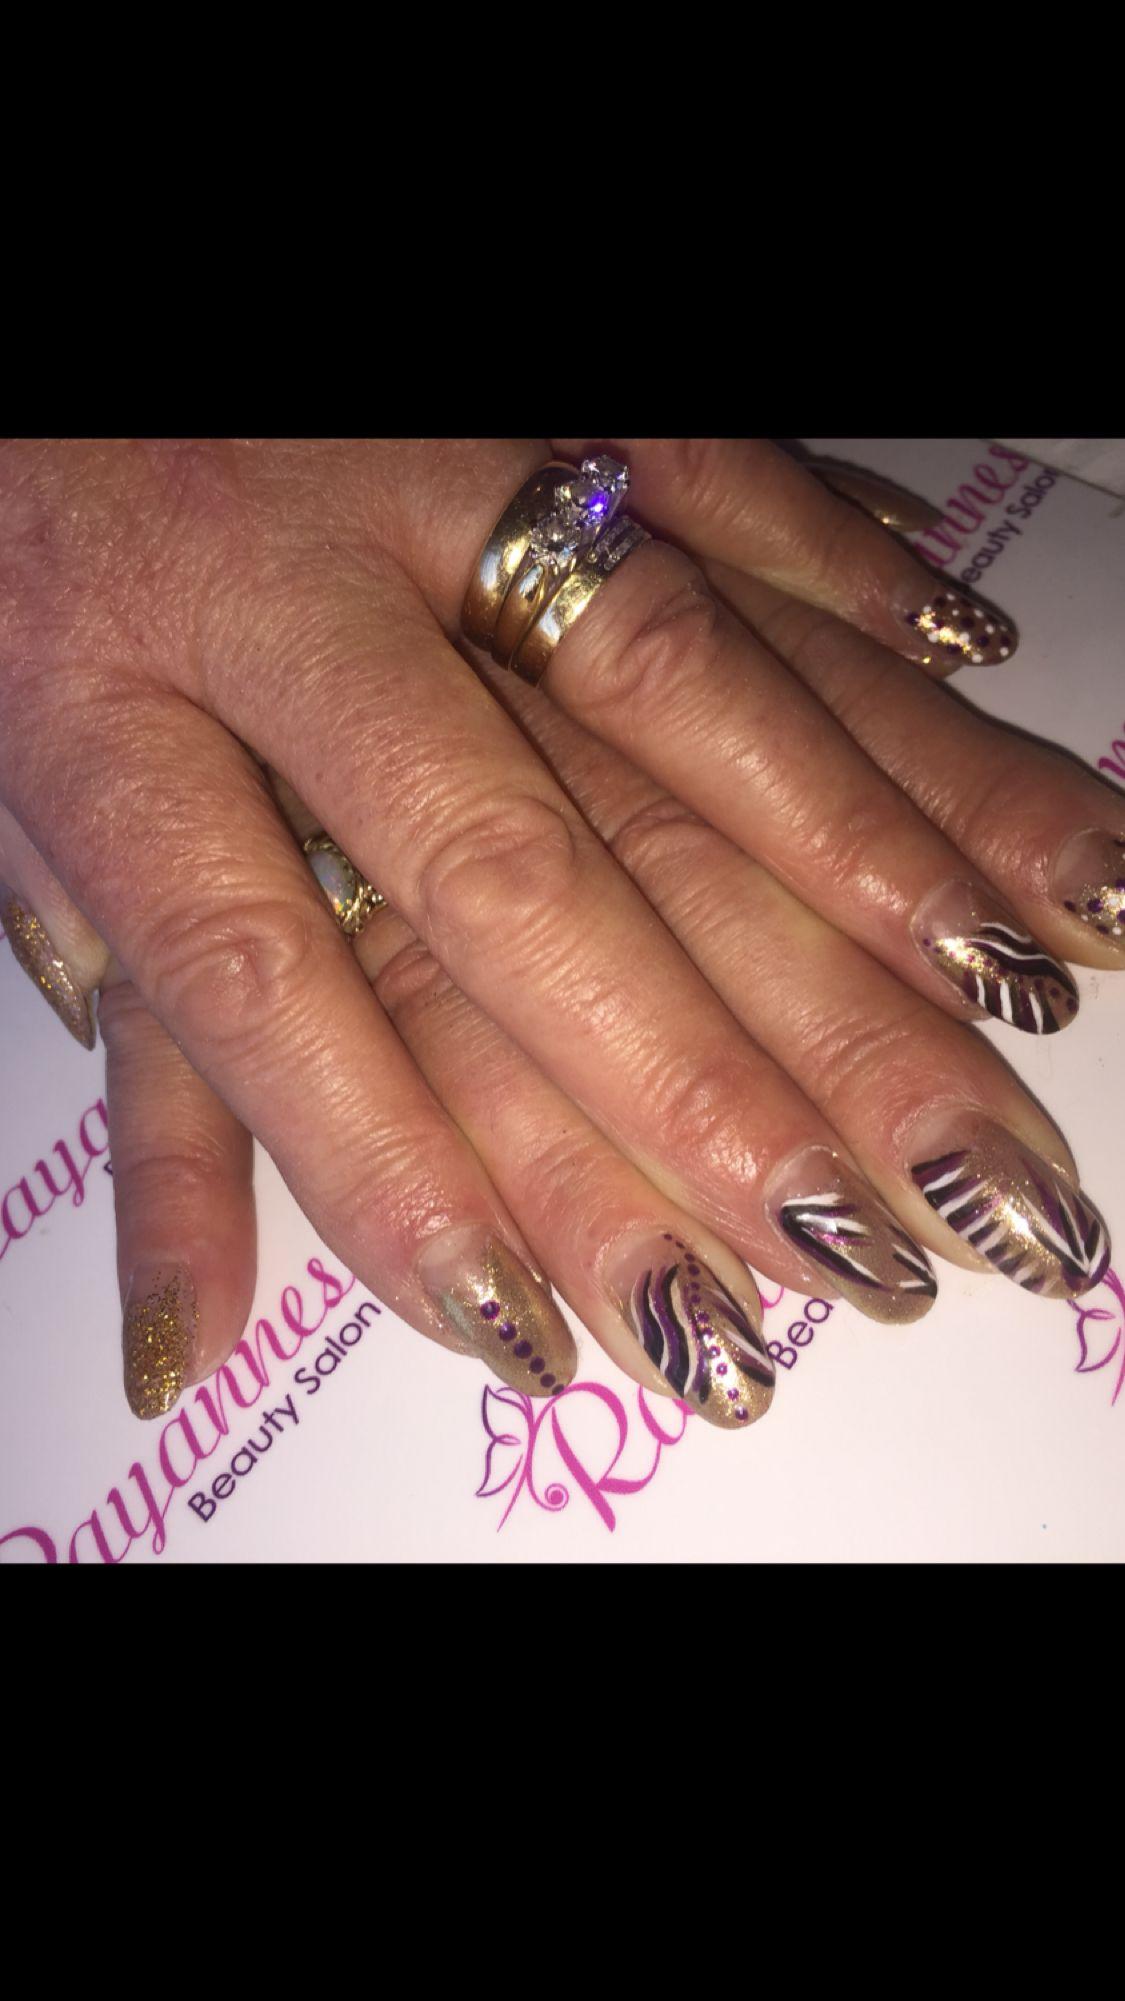 Rayannes Beauty Salon Nails, Class ring, Beauty salon